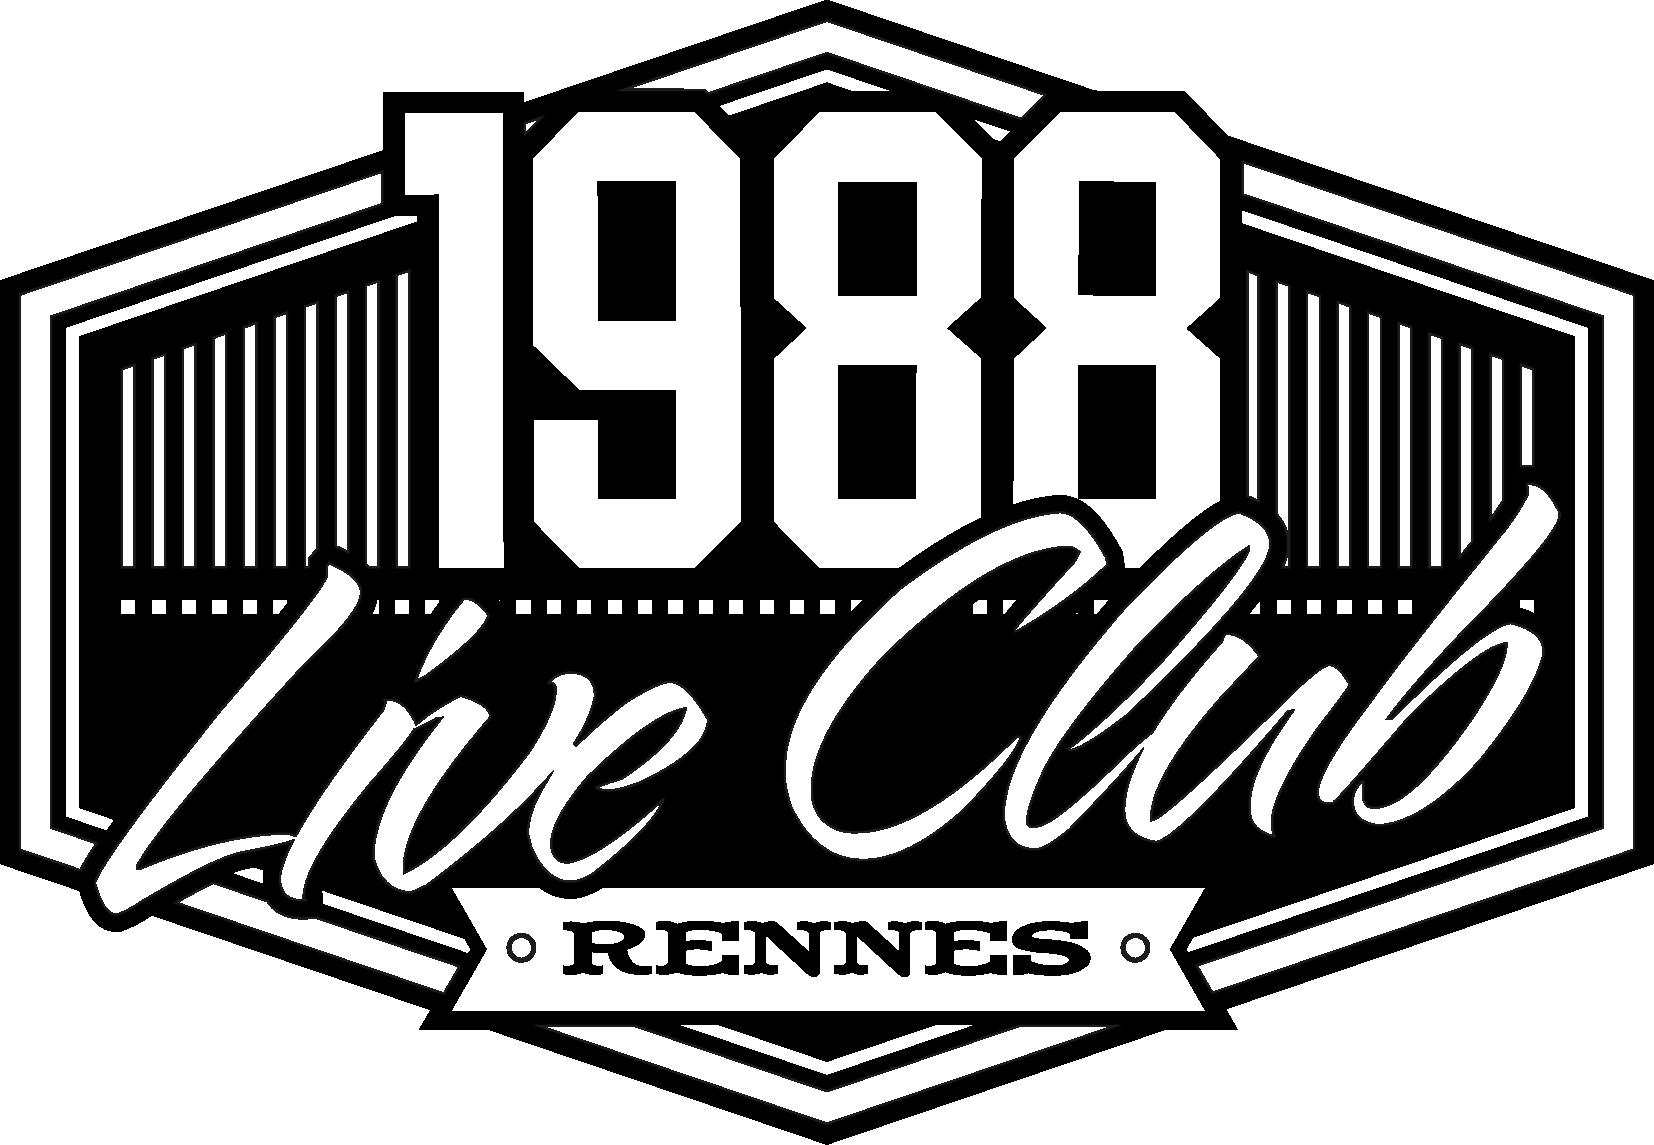 Logo 1988 noir et blanc 1